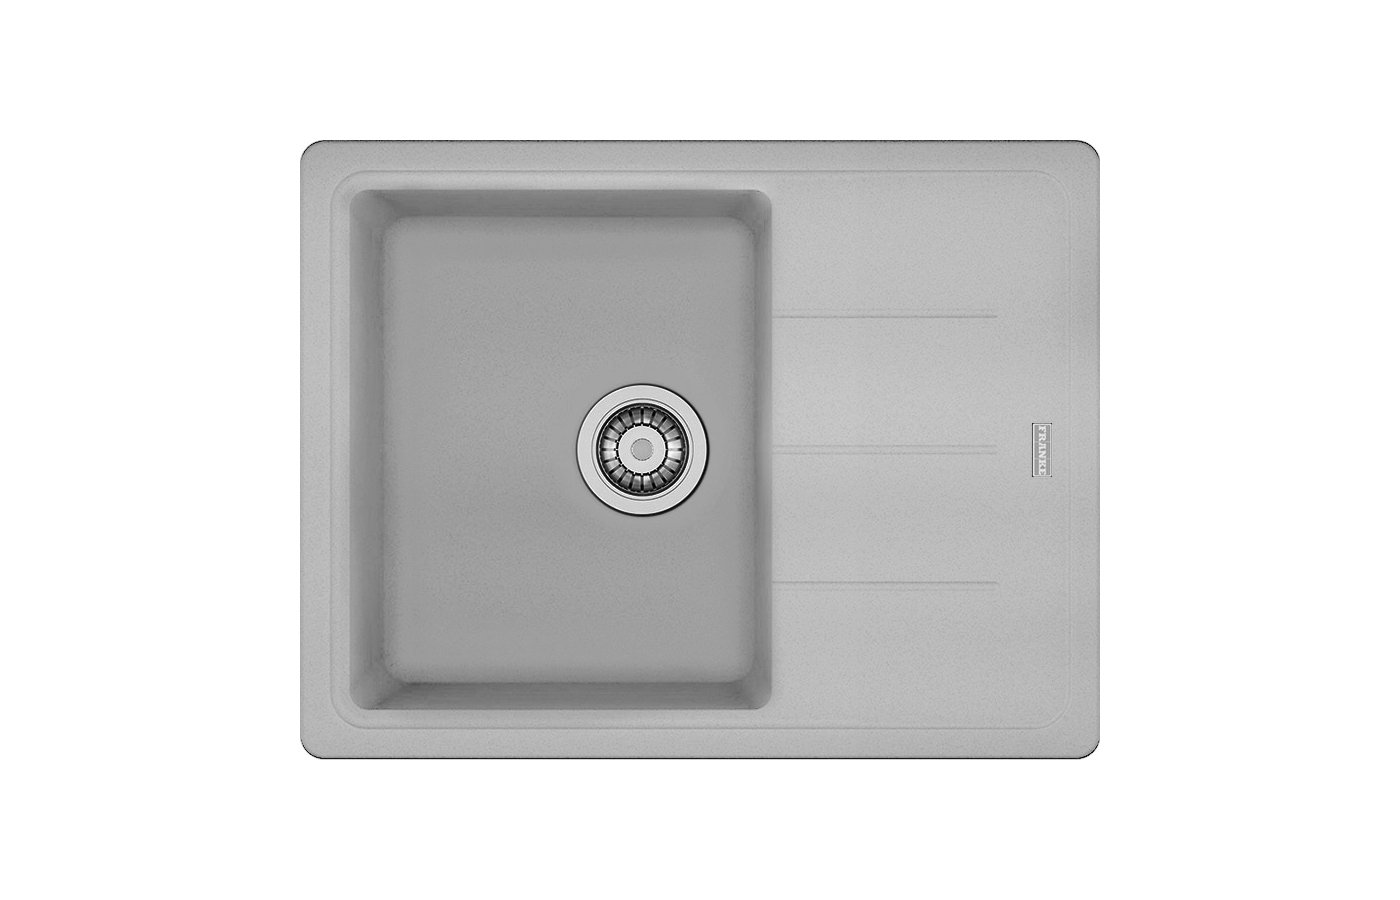 Кухонная мойка FRANKE MRG 611C серебро